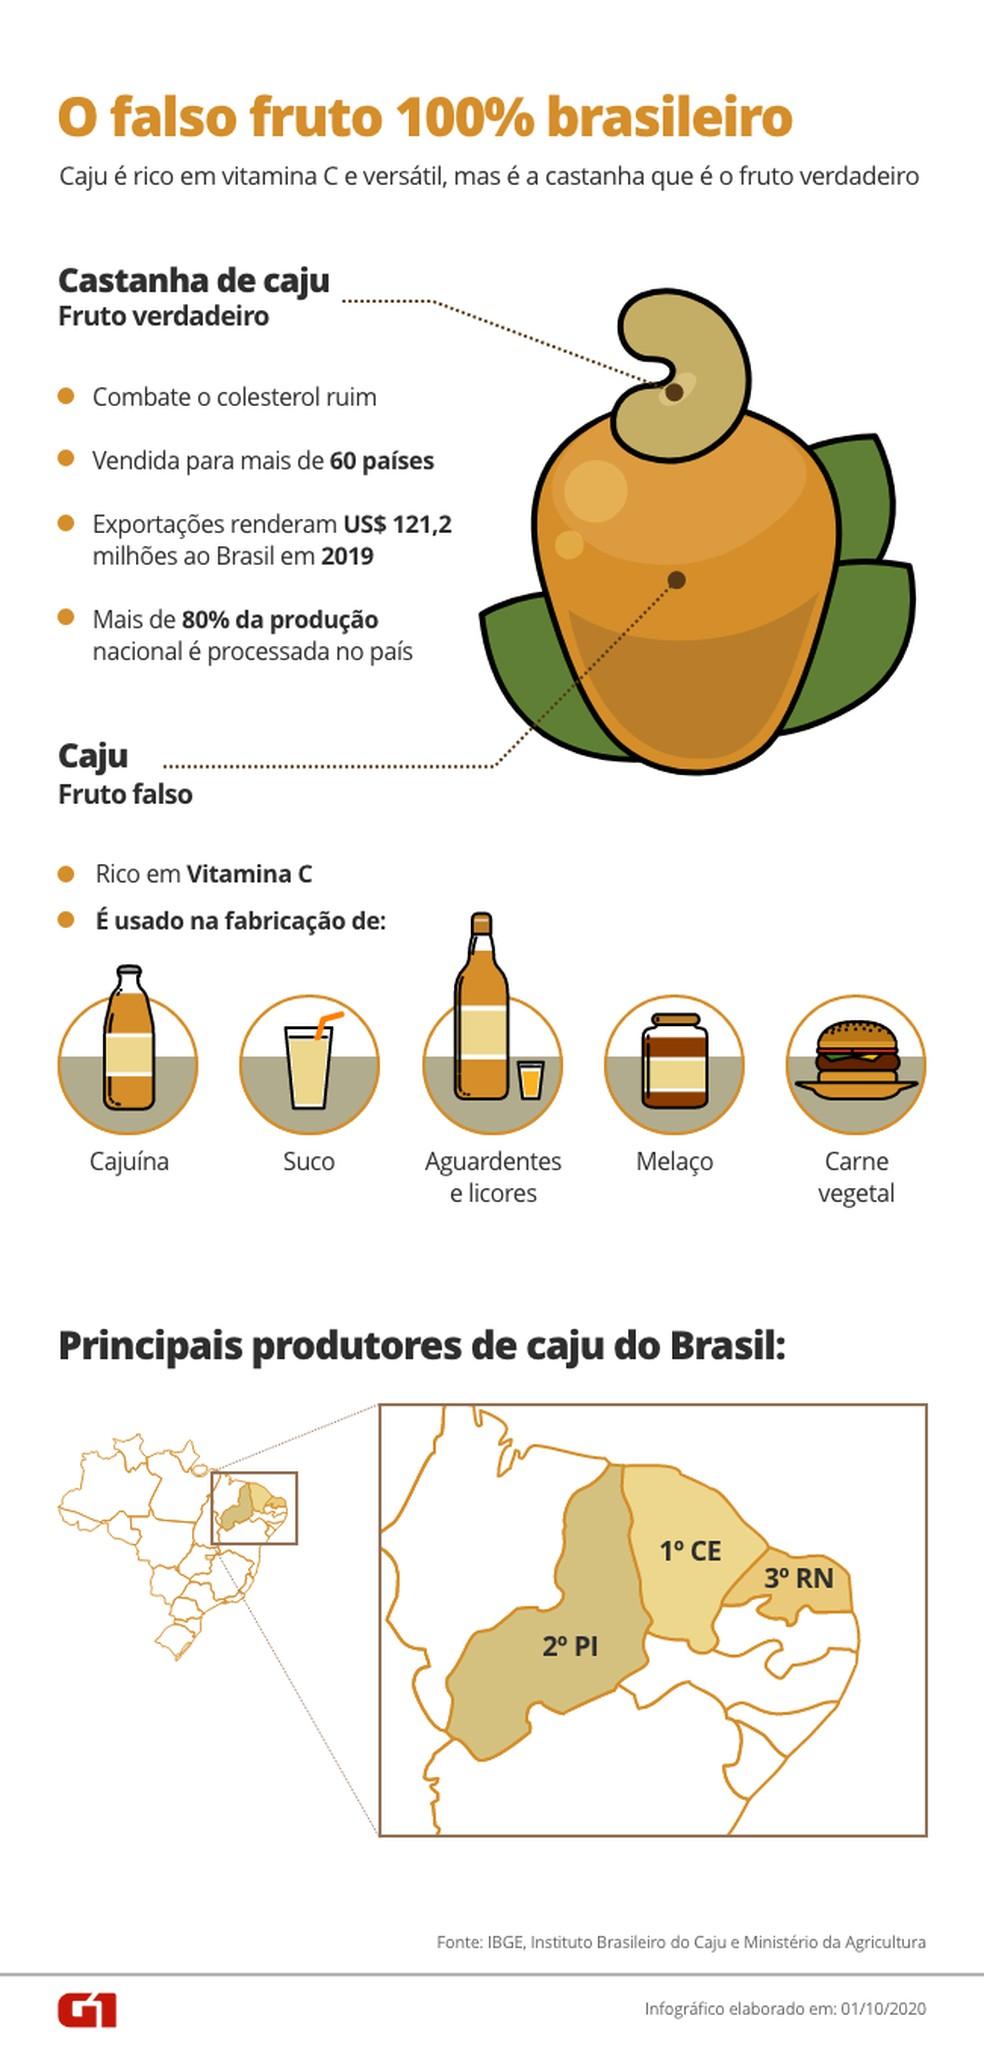 O falso fruto 100% brasileiro — Foto: Arte G1